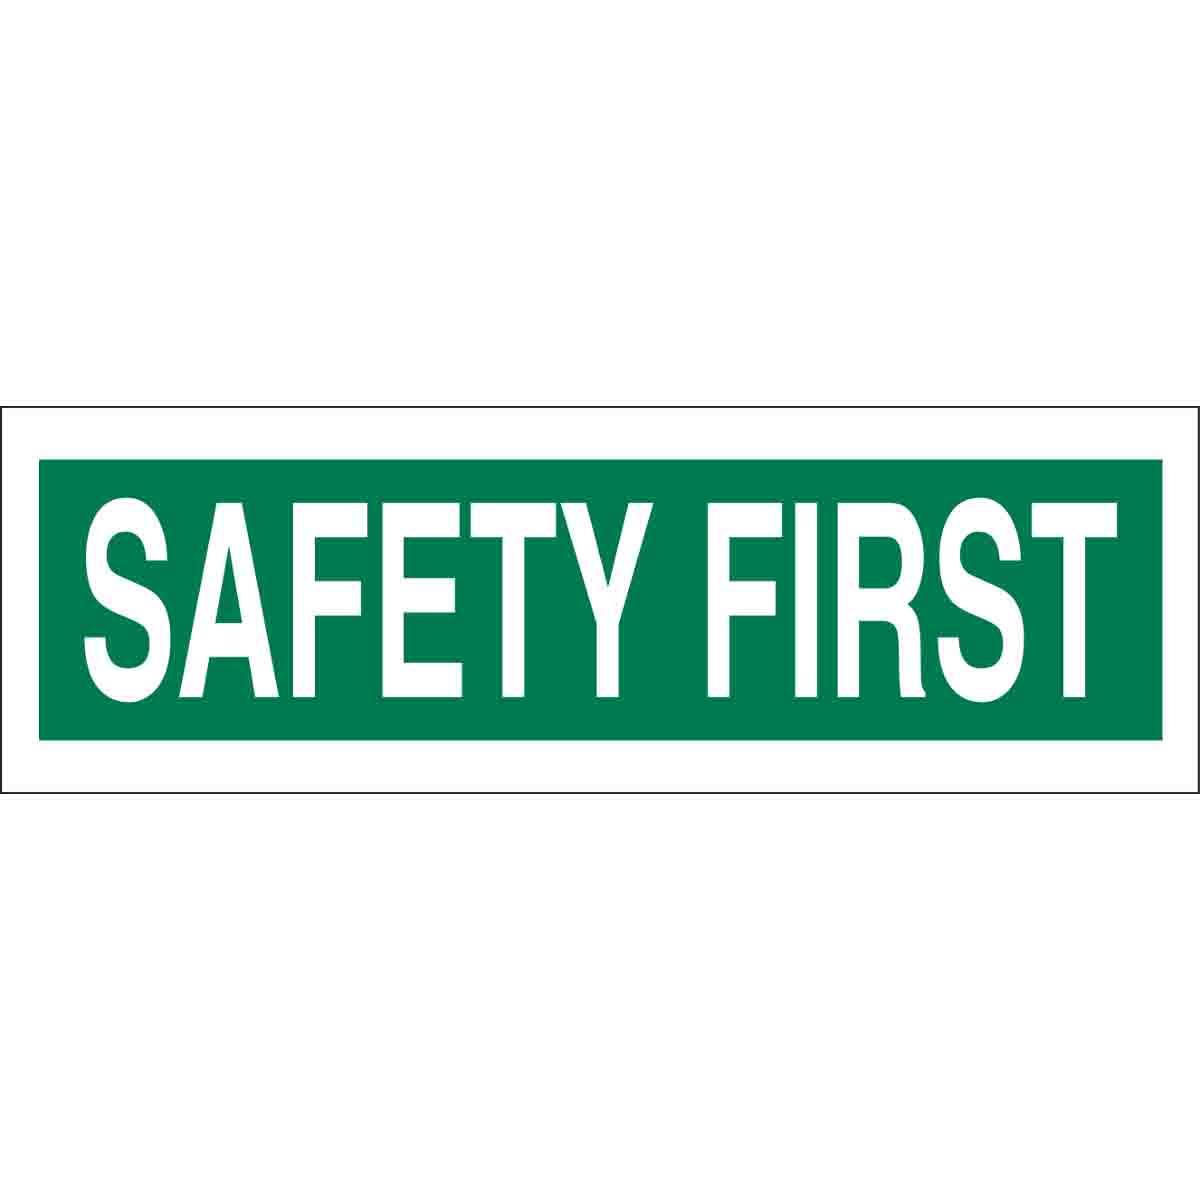 brady part 88941 safety first sign. Black Bedroom Furniture Sets. Home Design Ideas